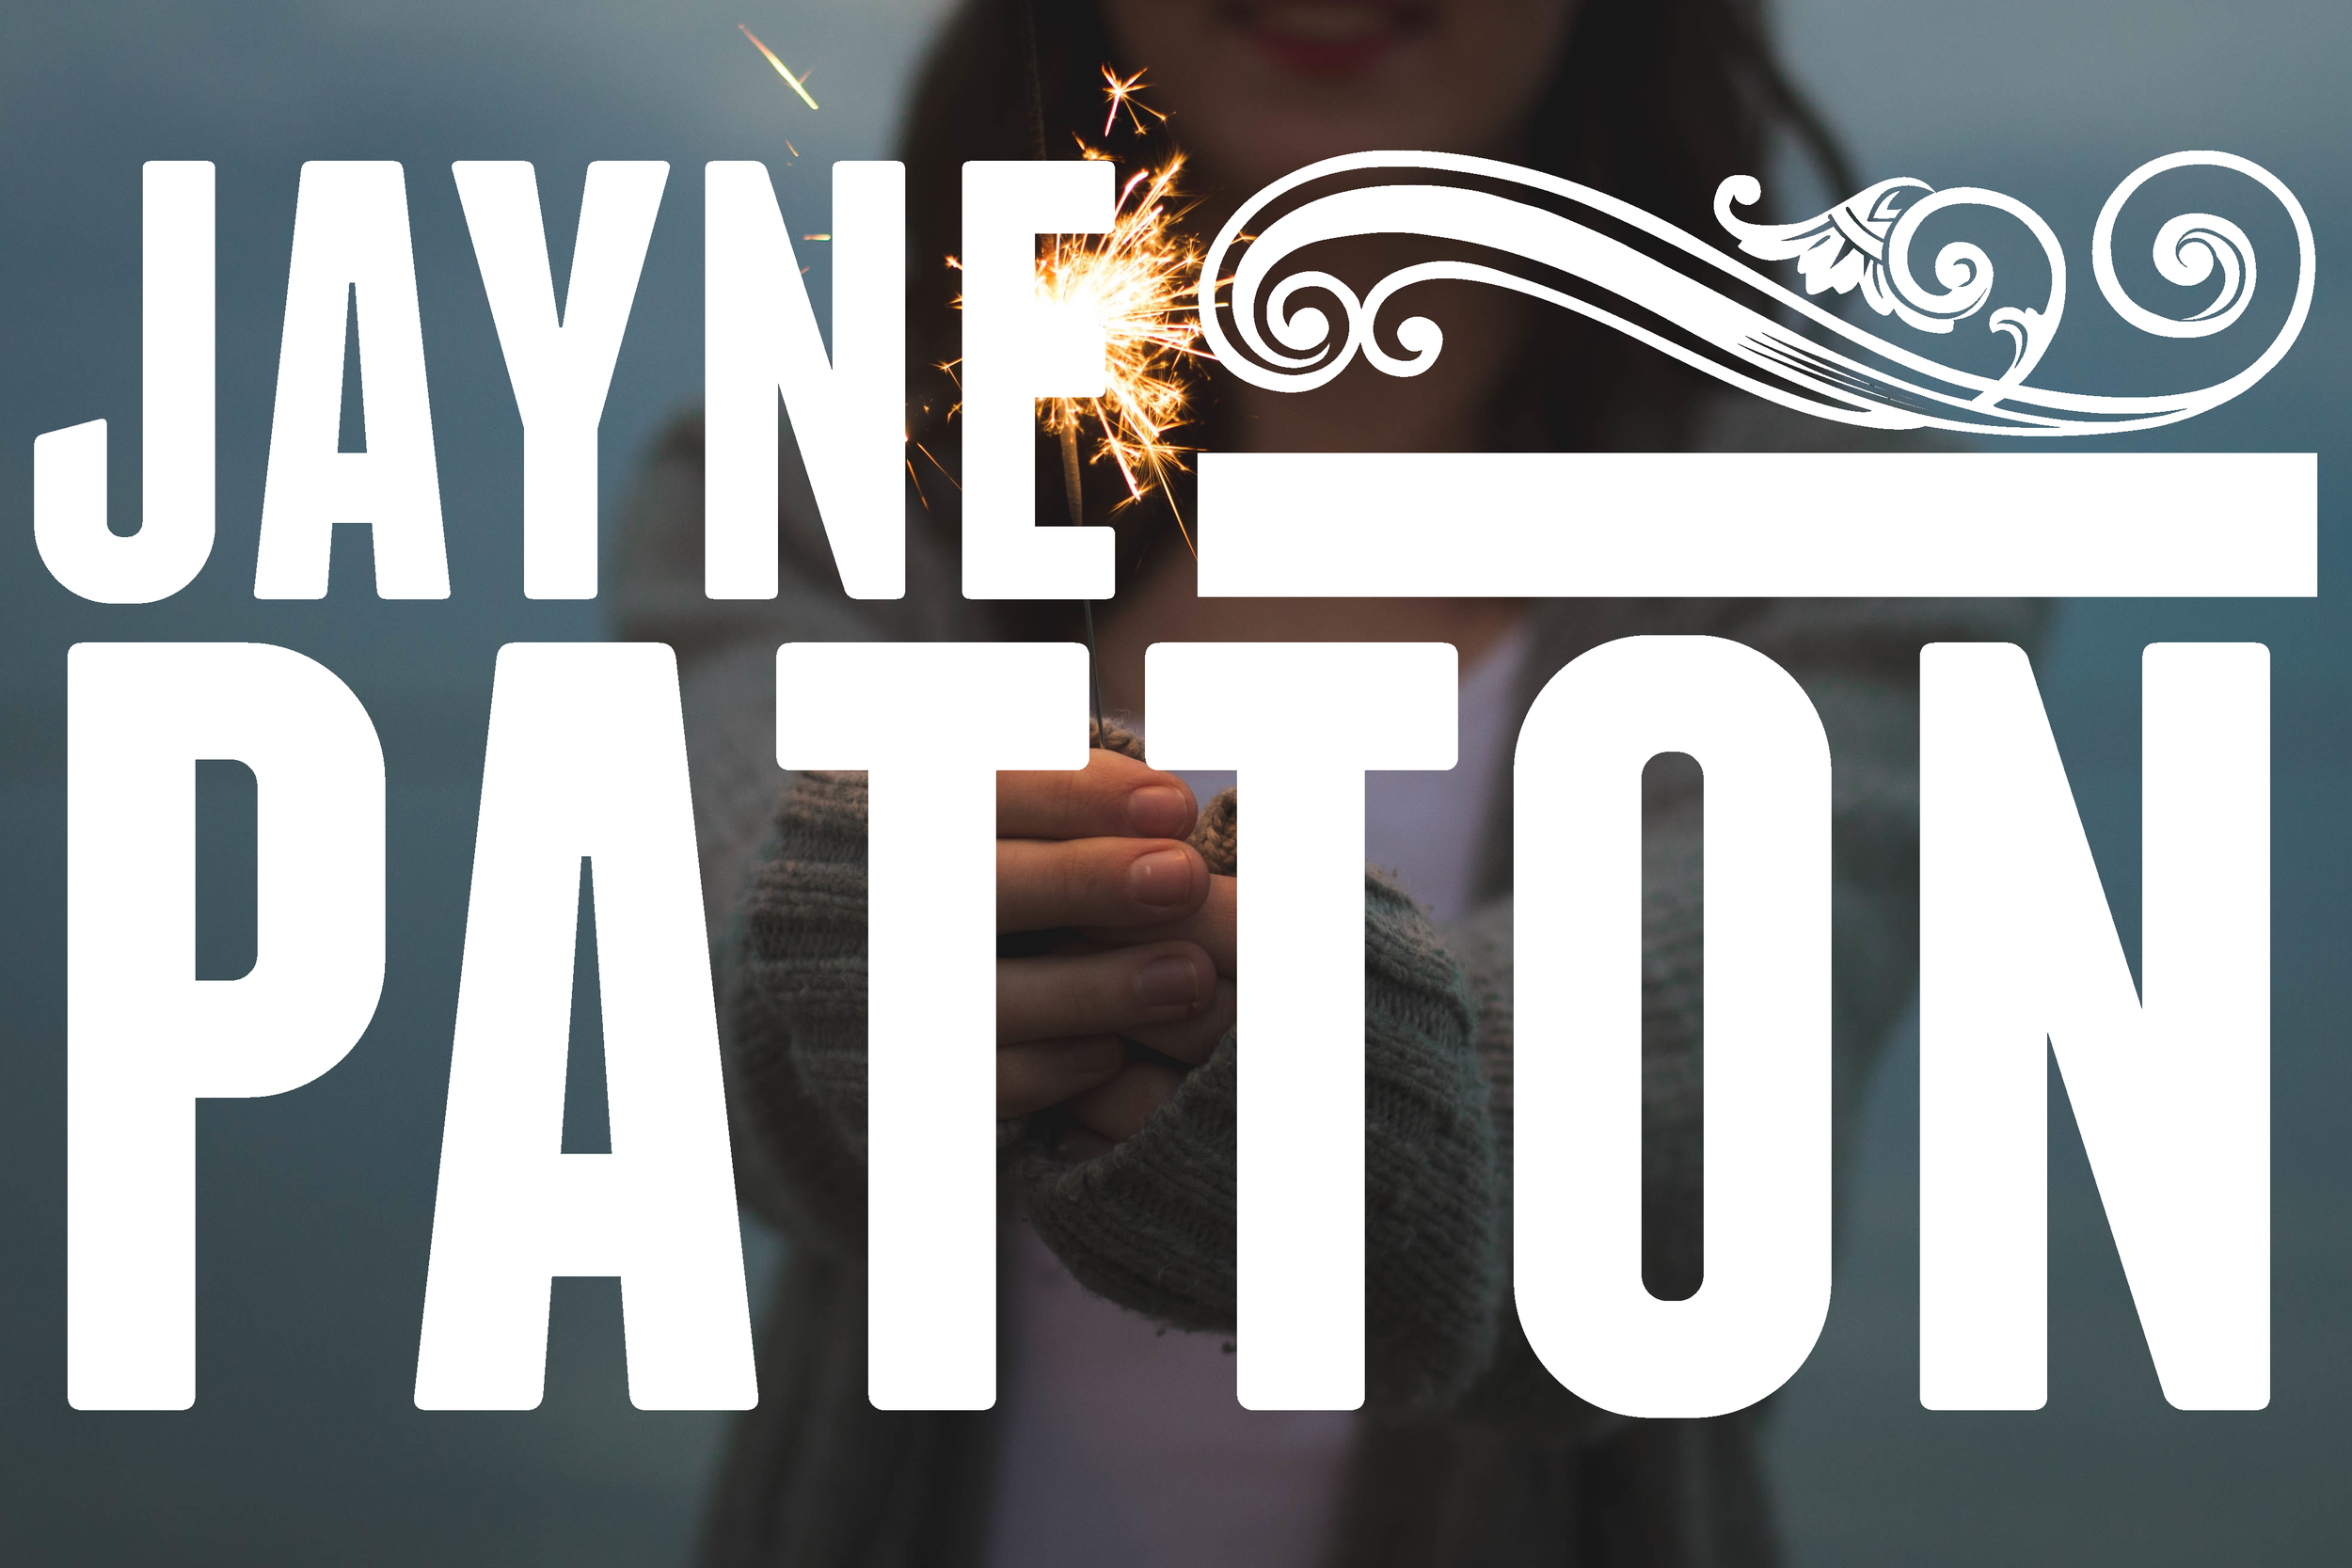 Jayne Patton